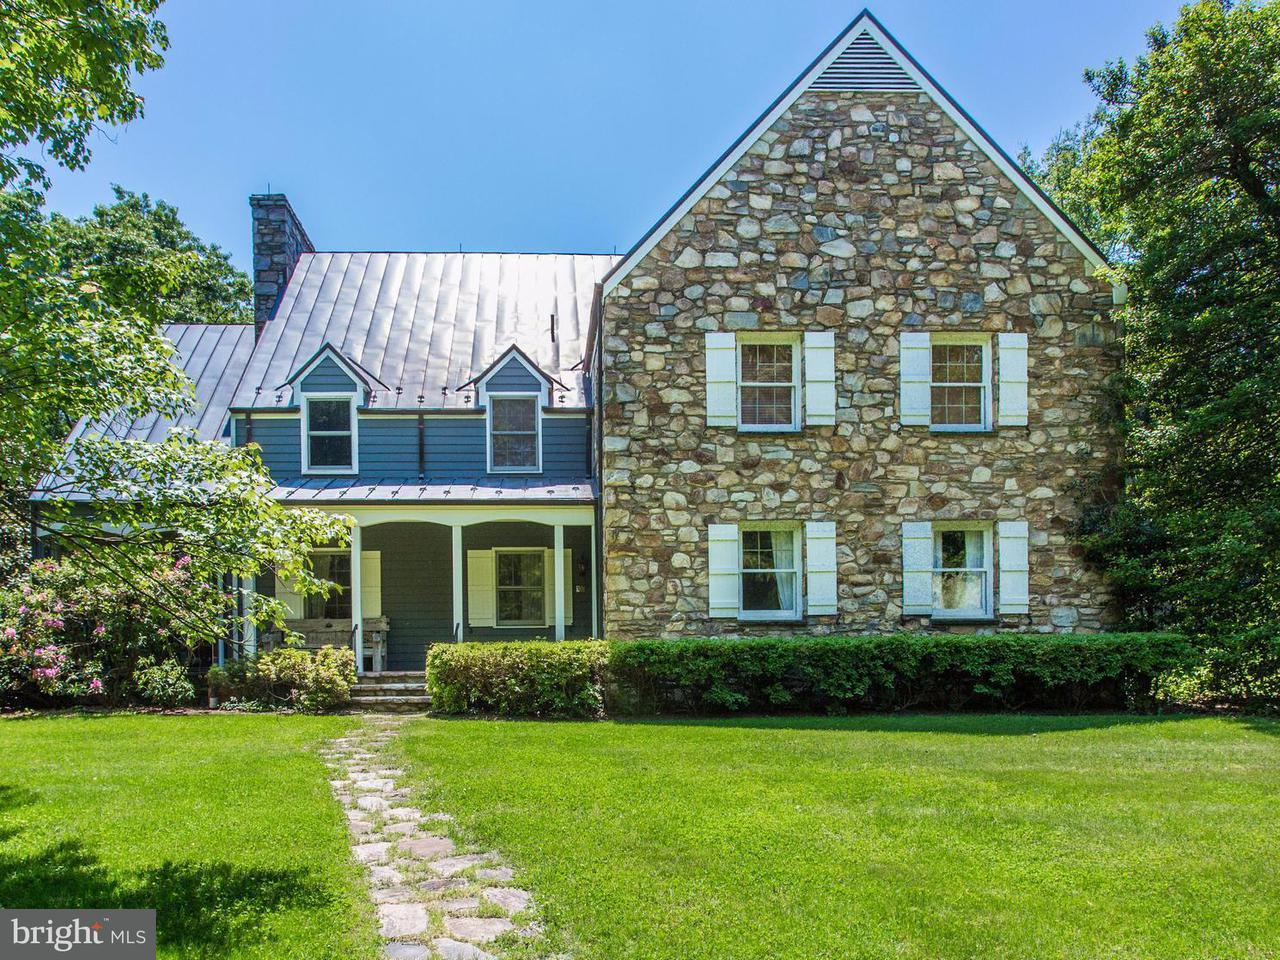 独户住宅 为 销售 在 3204 Mountain Road 3204 Mountain Road Haymarket, 弗吉尼亚州 20169 美国